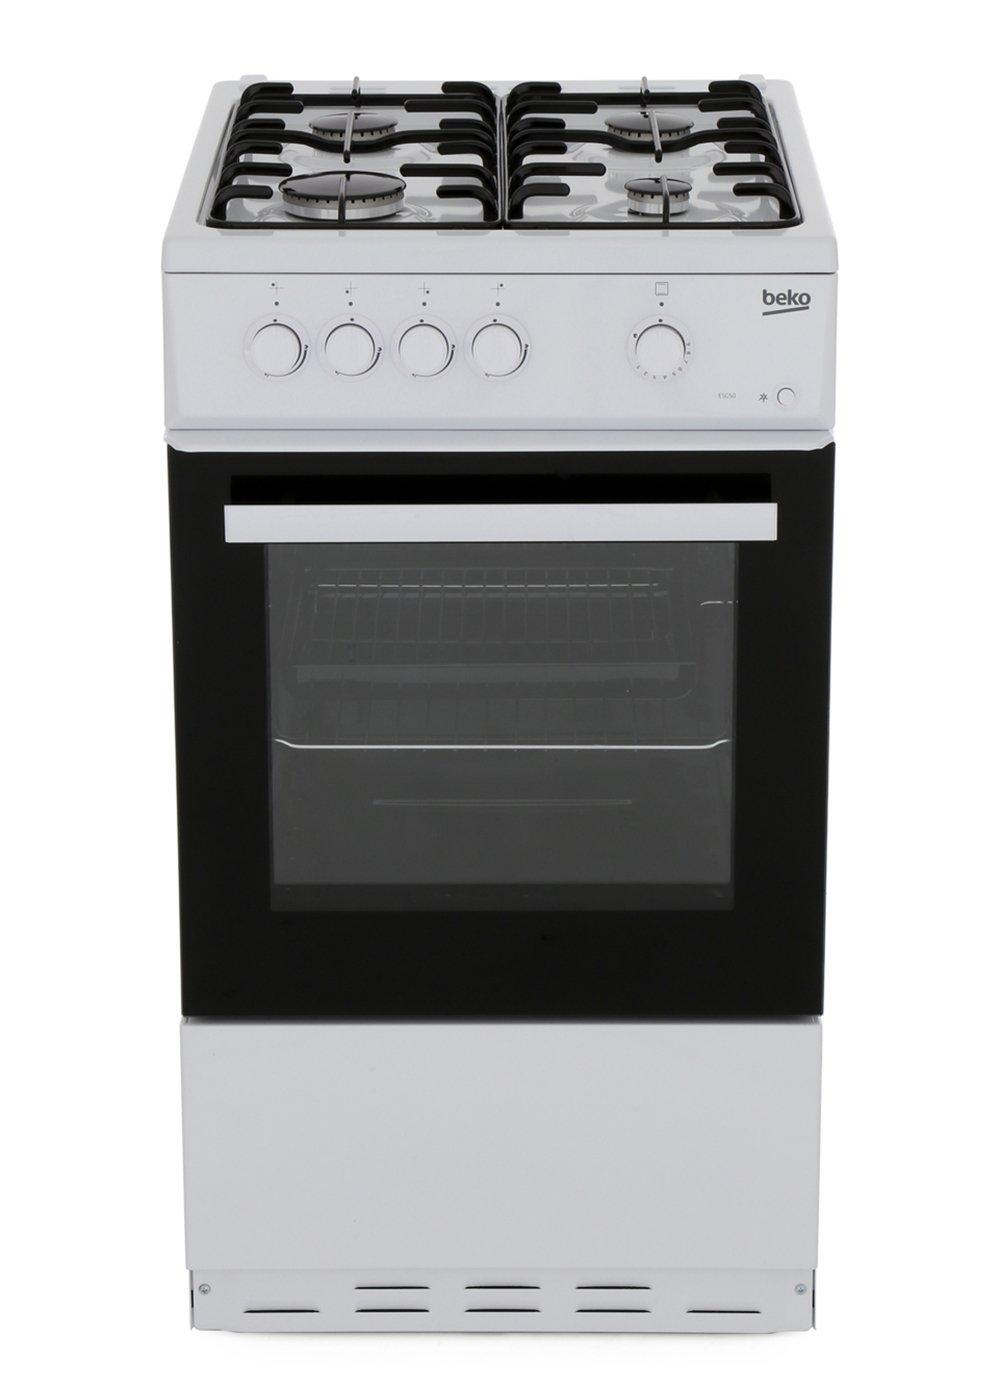 Beko ESG50W Gas Cooker with Single Oven